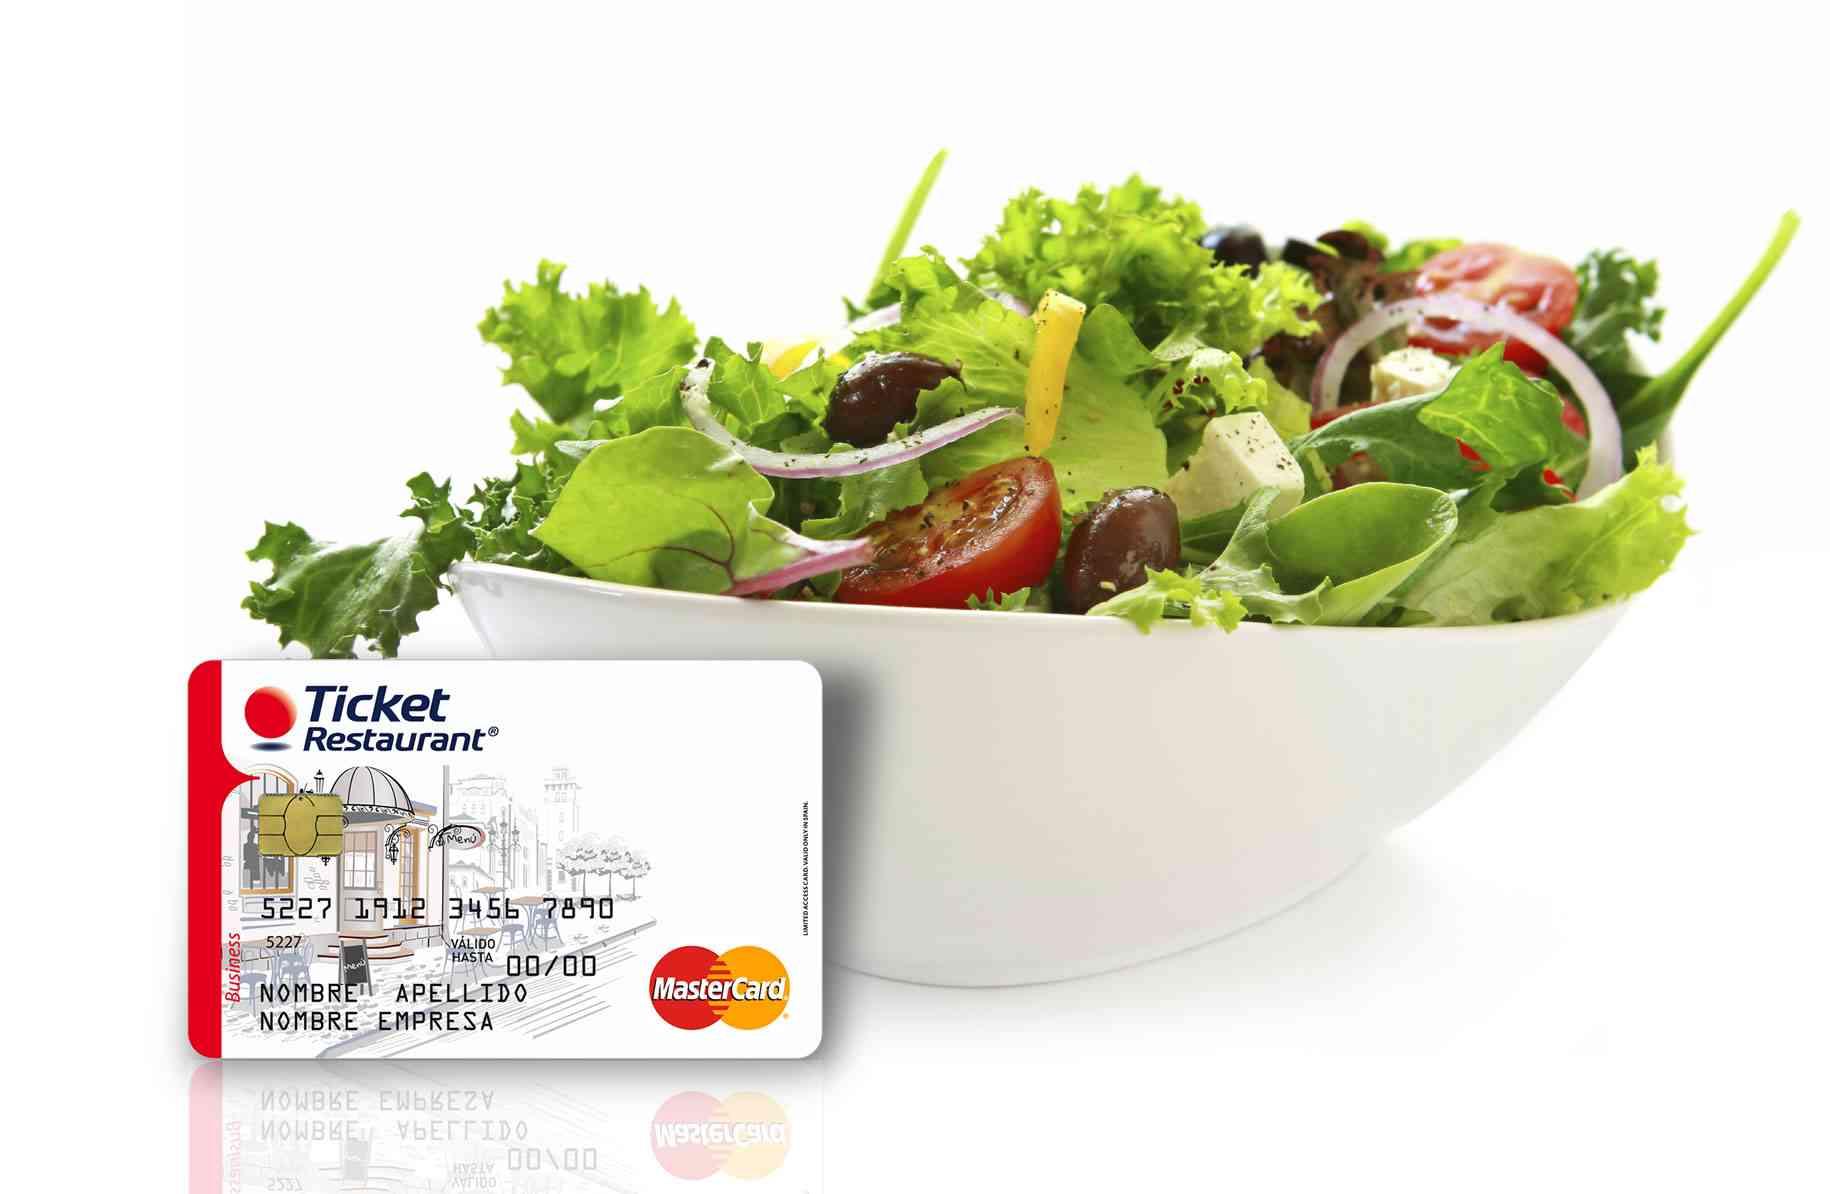 tarjeta ticket restaurant